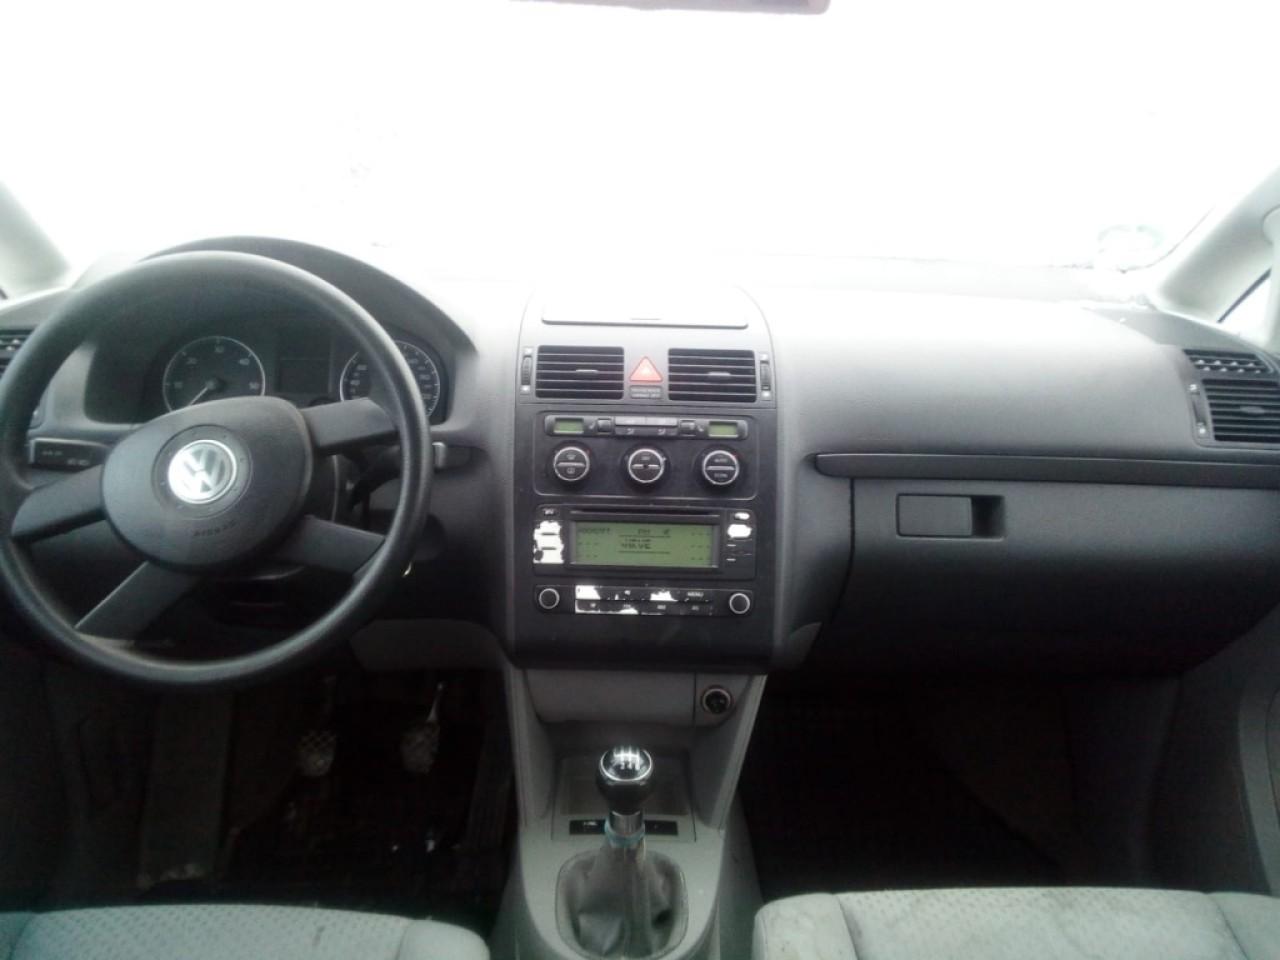 Instalatie electrica completa VW Touran 2003 Monovolum 1.9 TDI